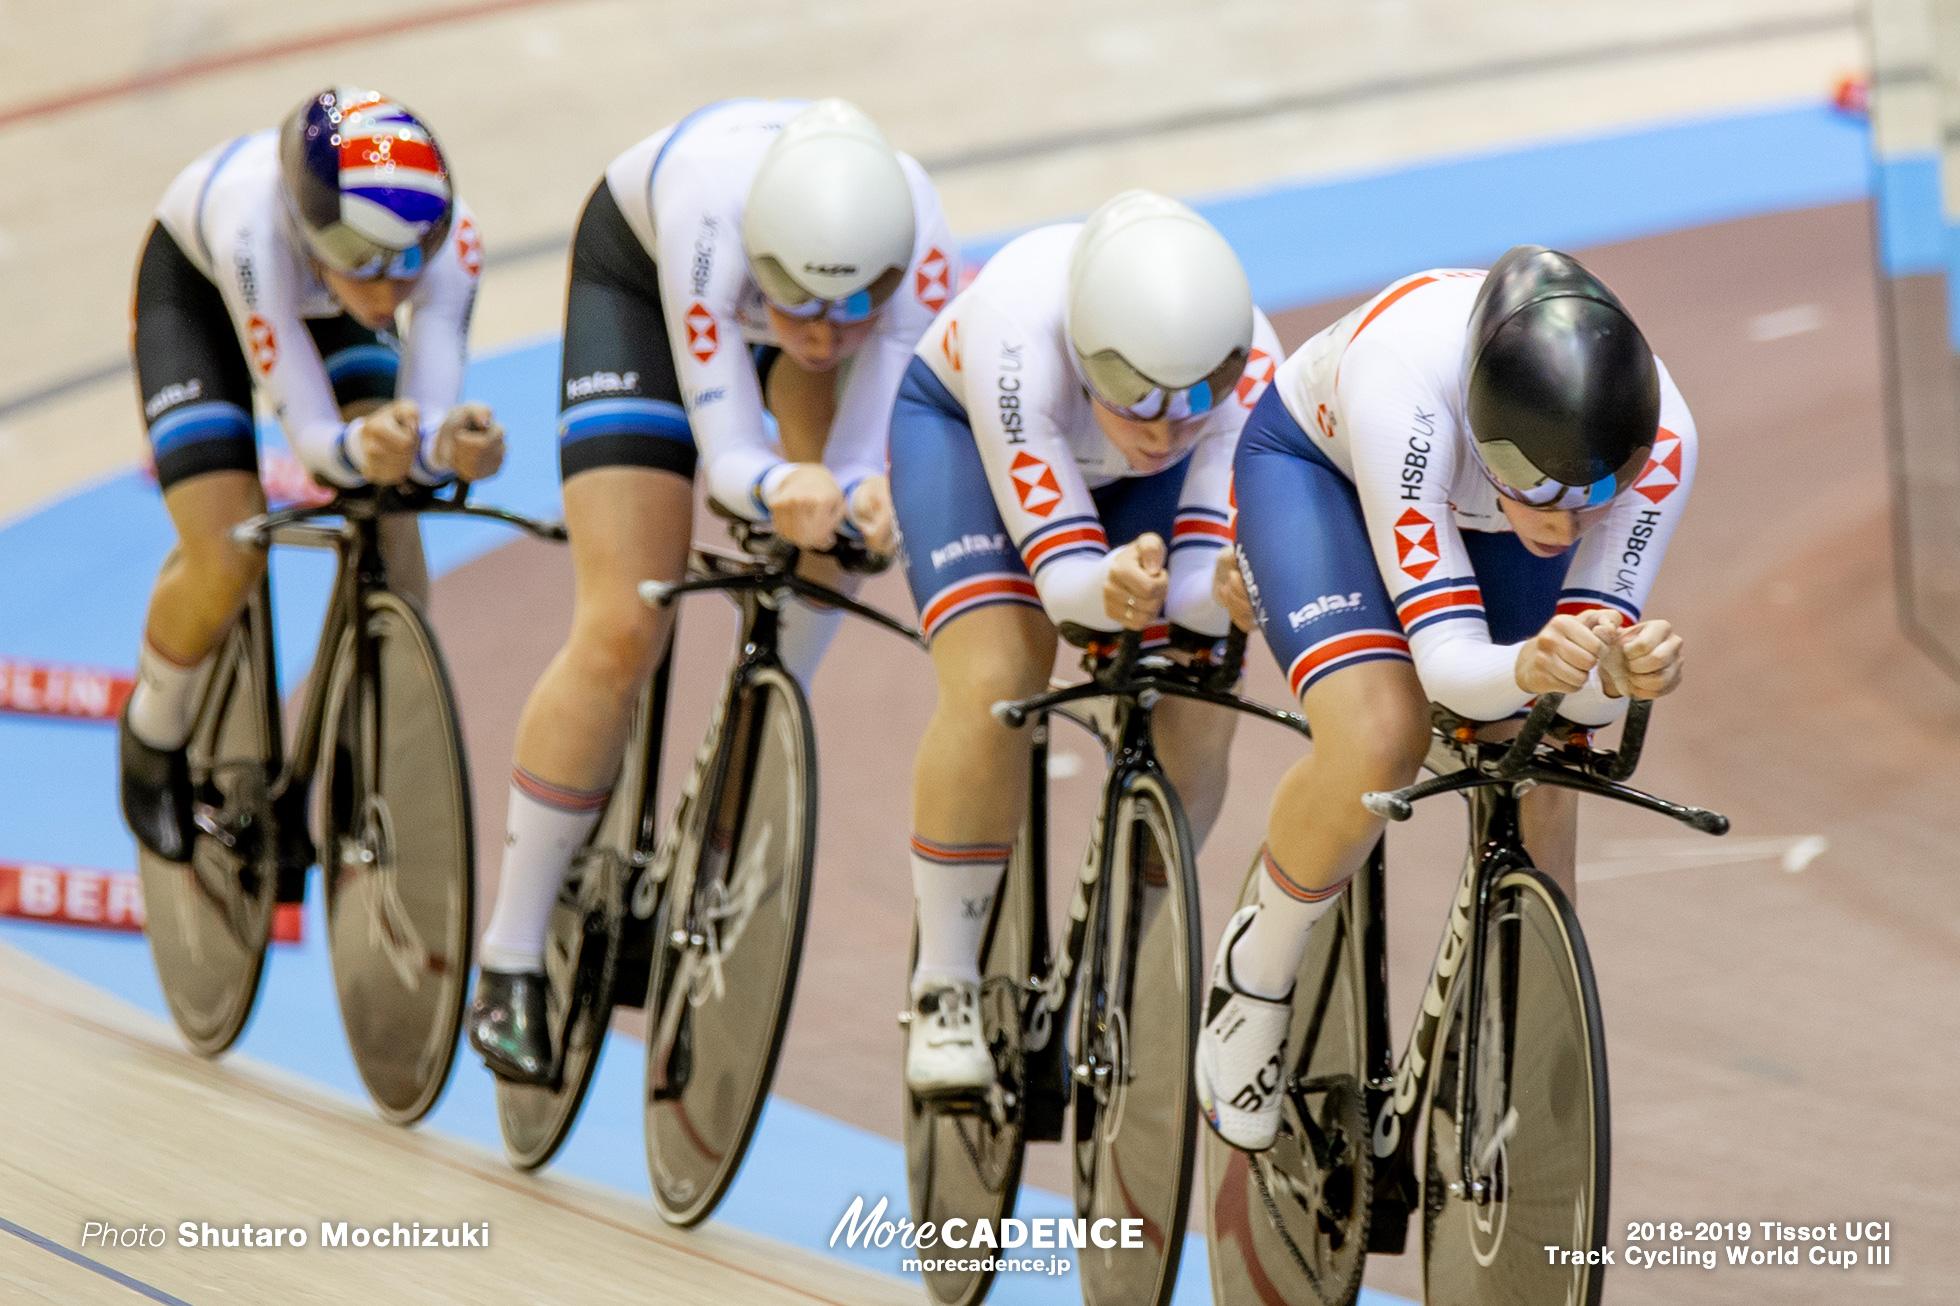 Women's Team Purusuit/2018-2019 Track Cycling World Cup III Berlin